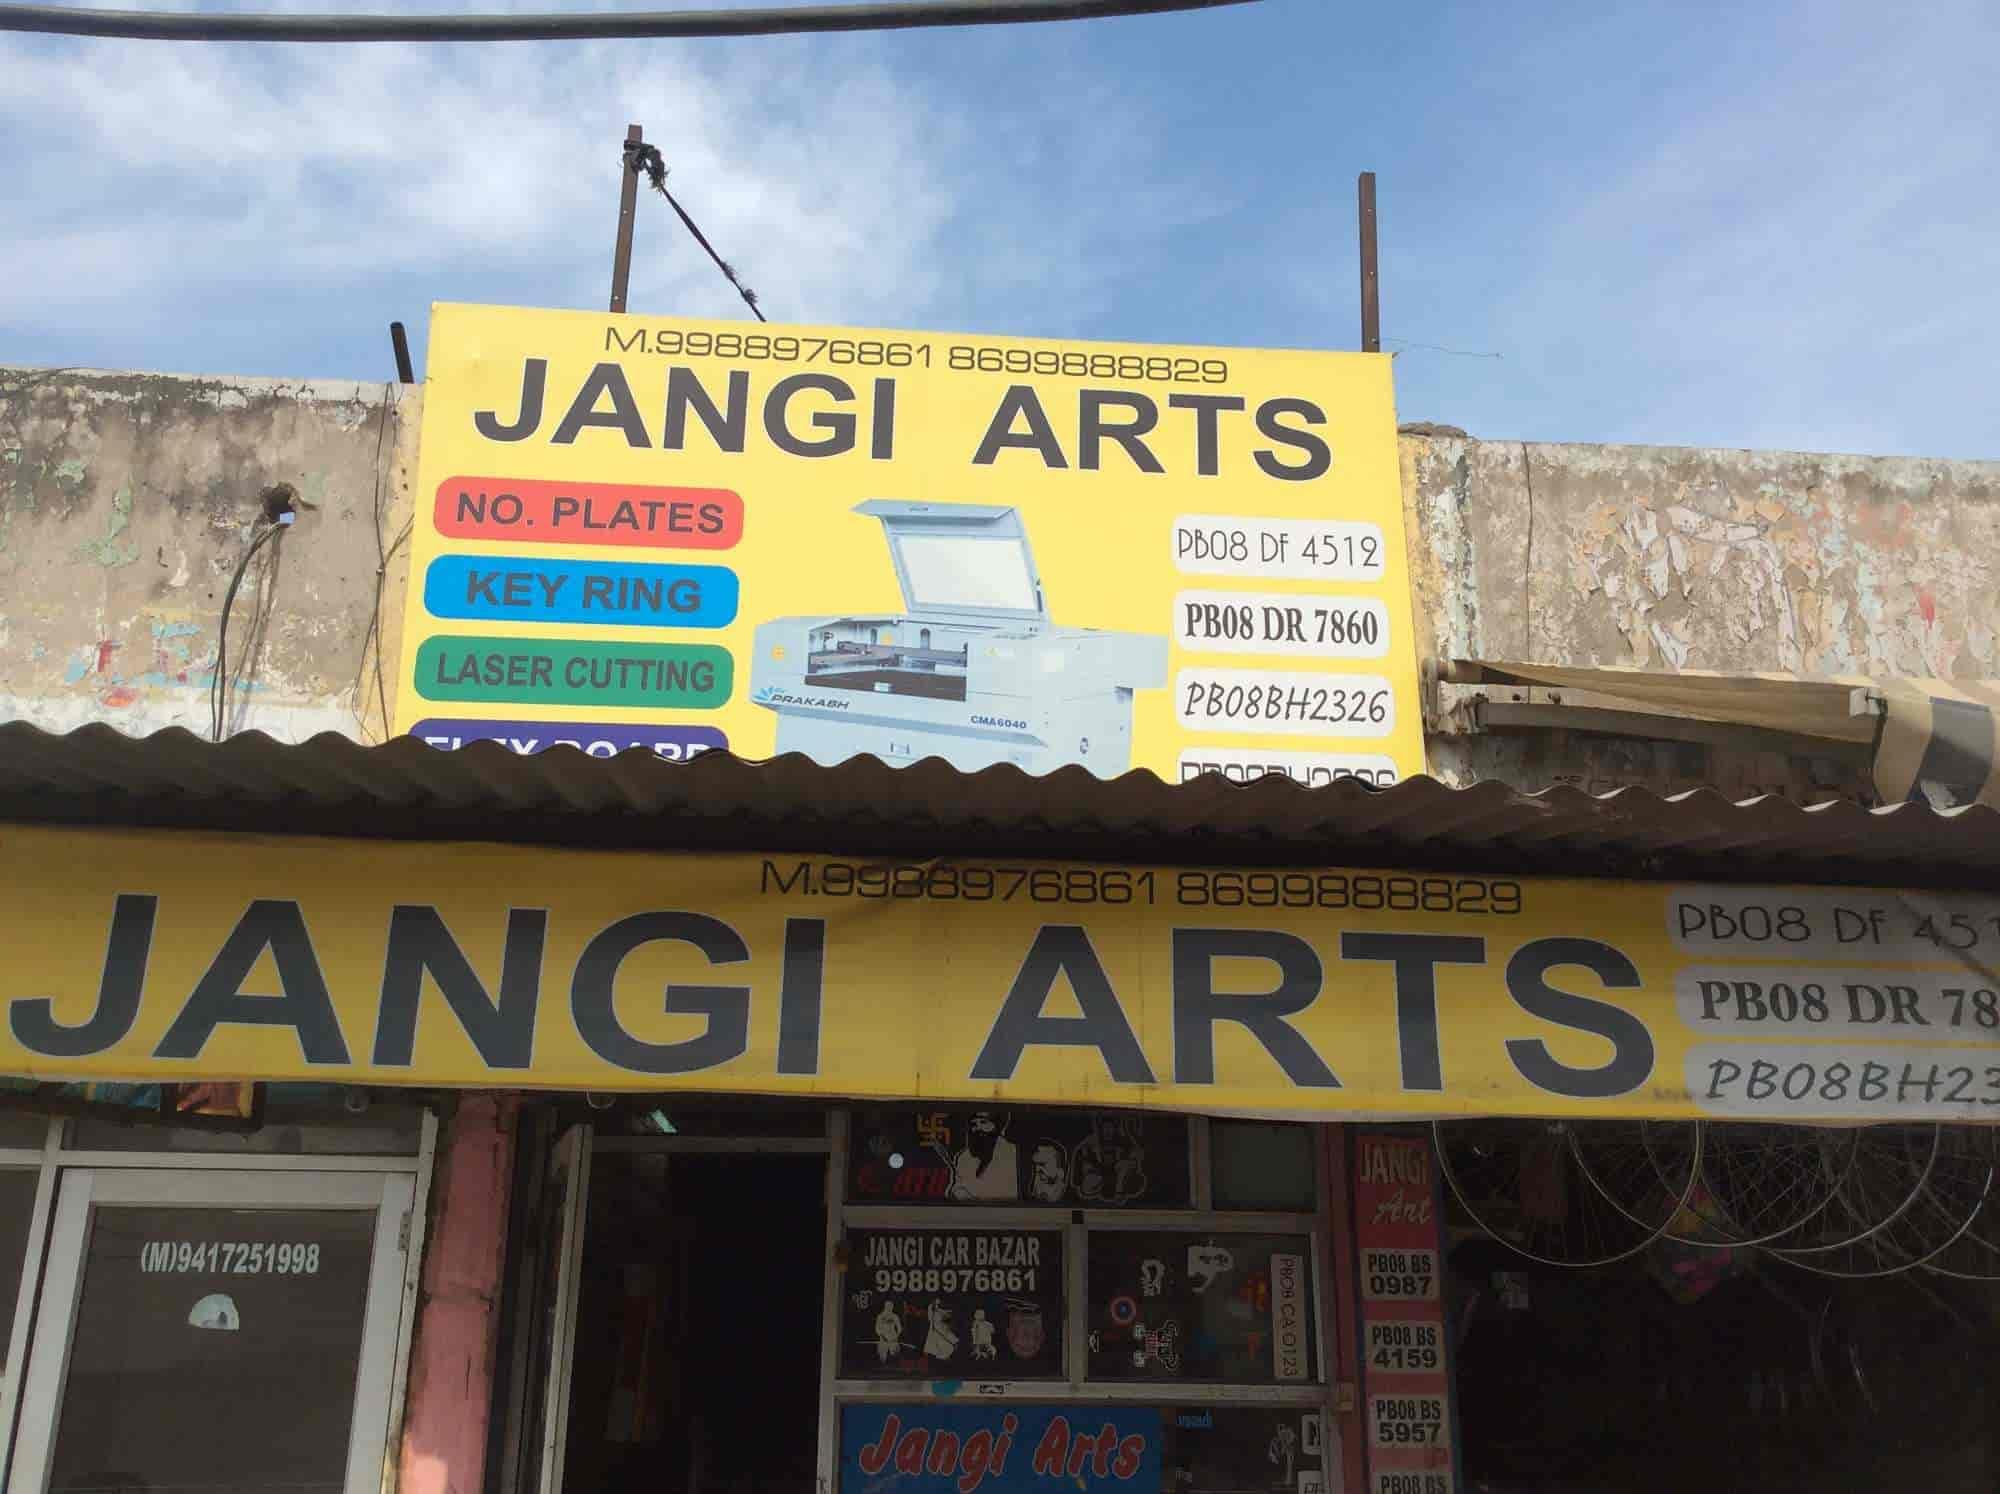 Jangi Arts Photos Jalandhar City Jalandhar Pictures Images Gallery Justdial